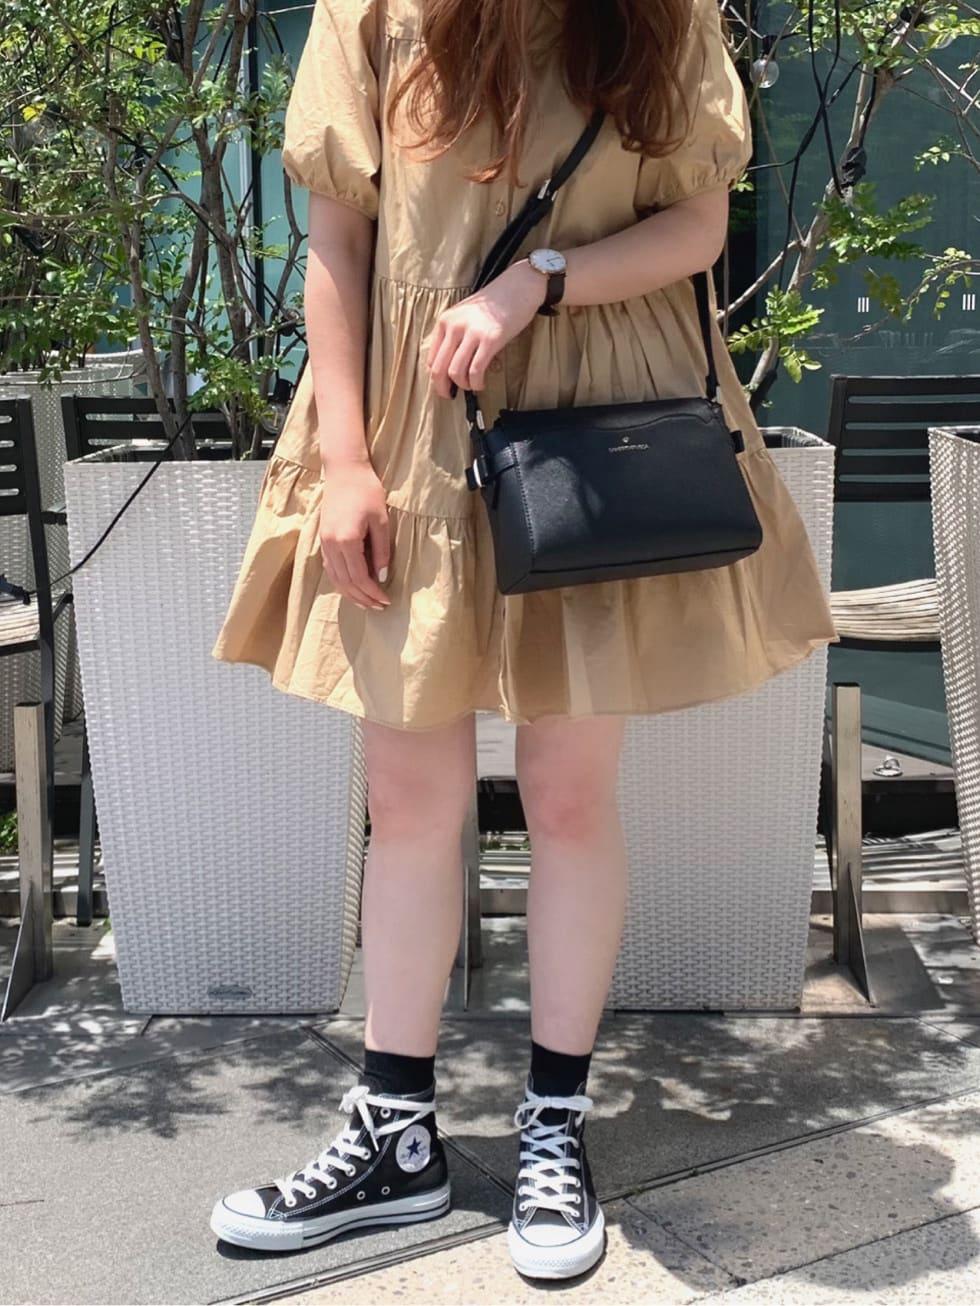 Reina Hanzawa